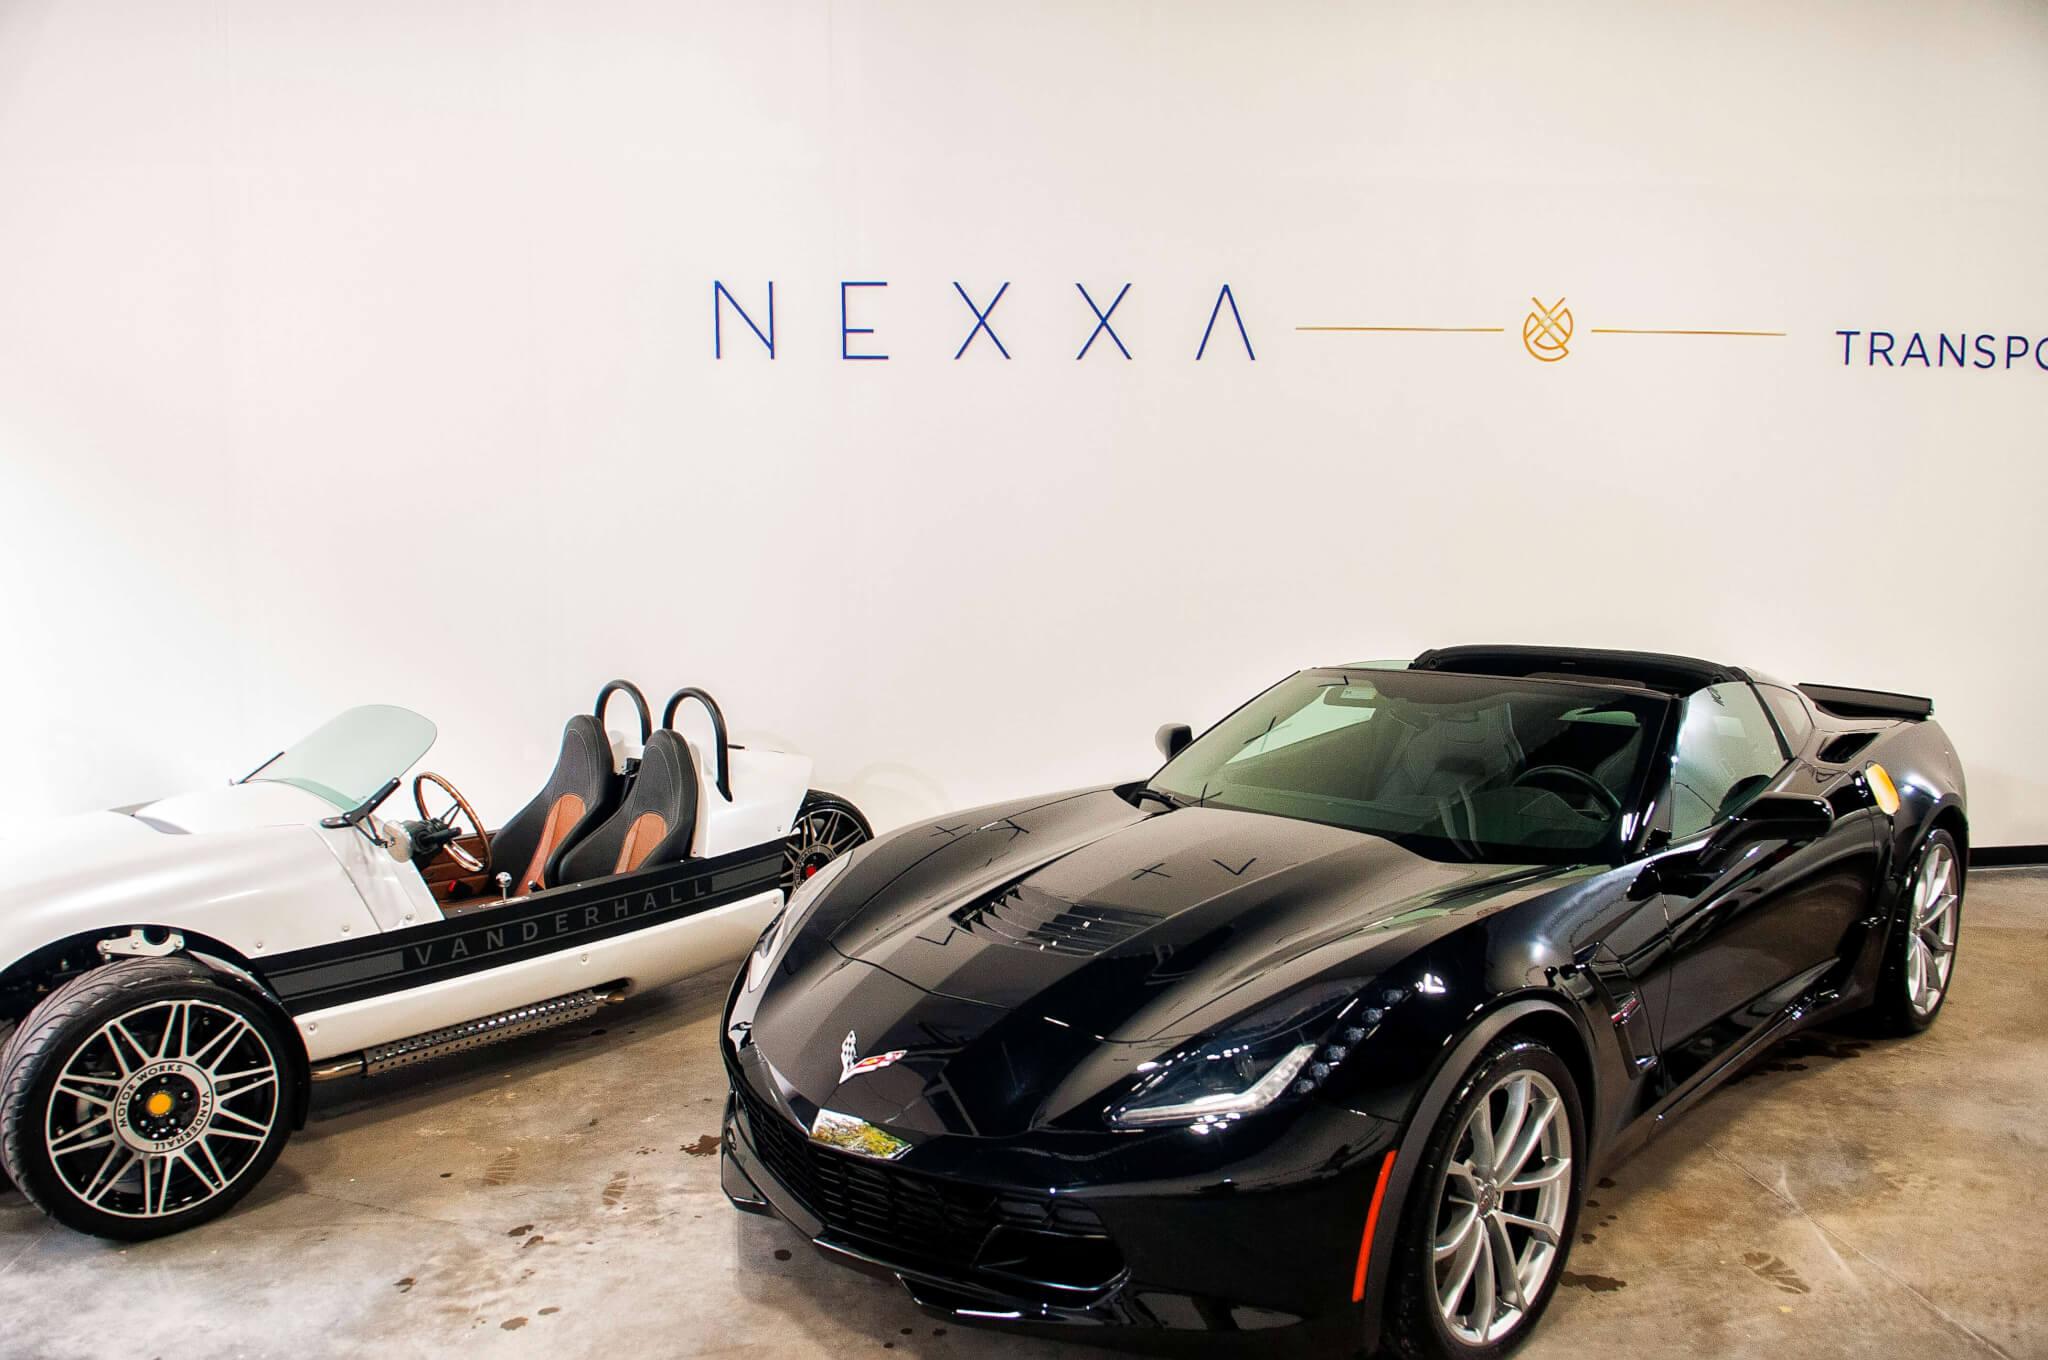 corvette and vander.jpg